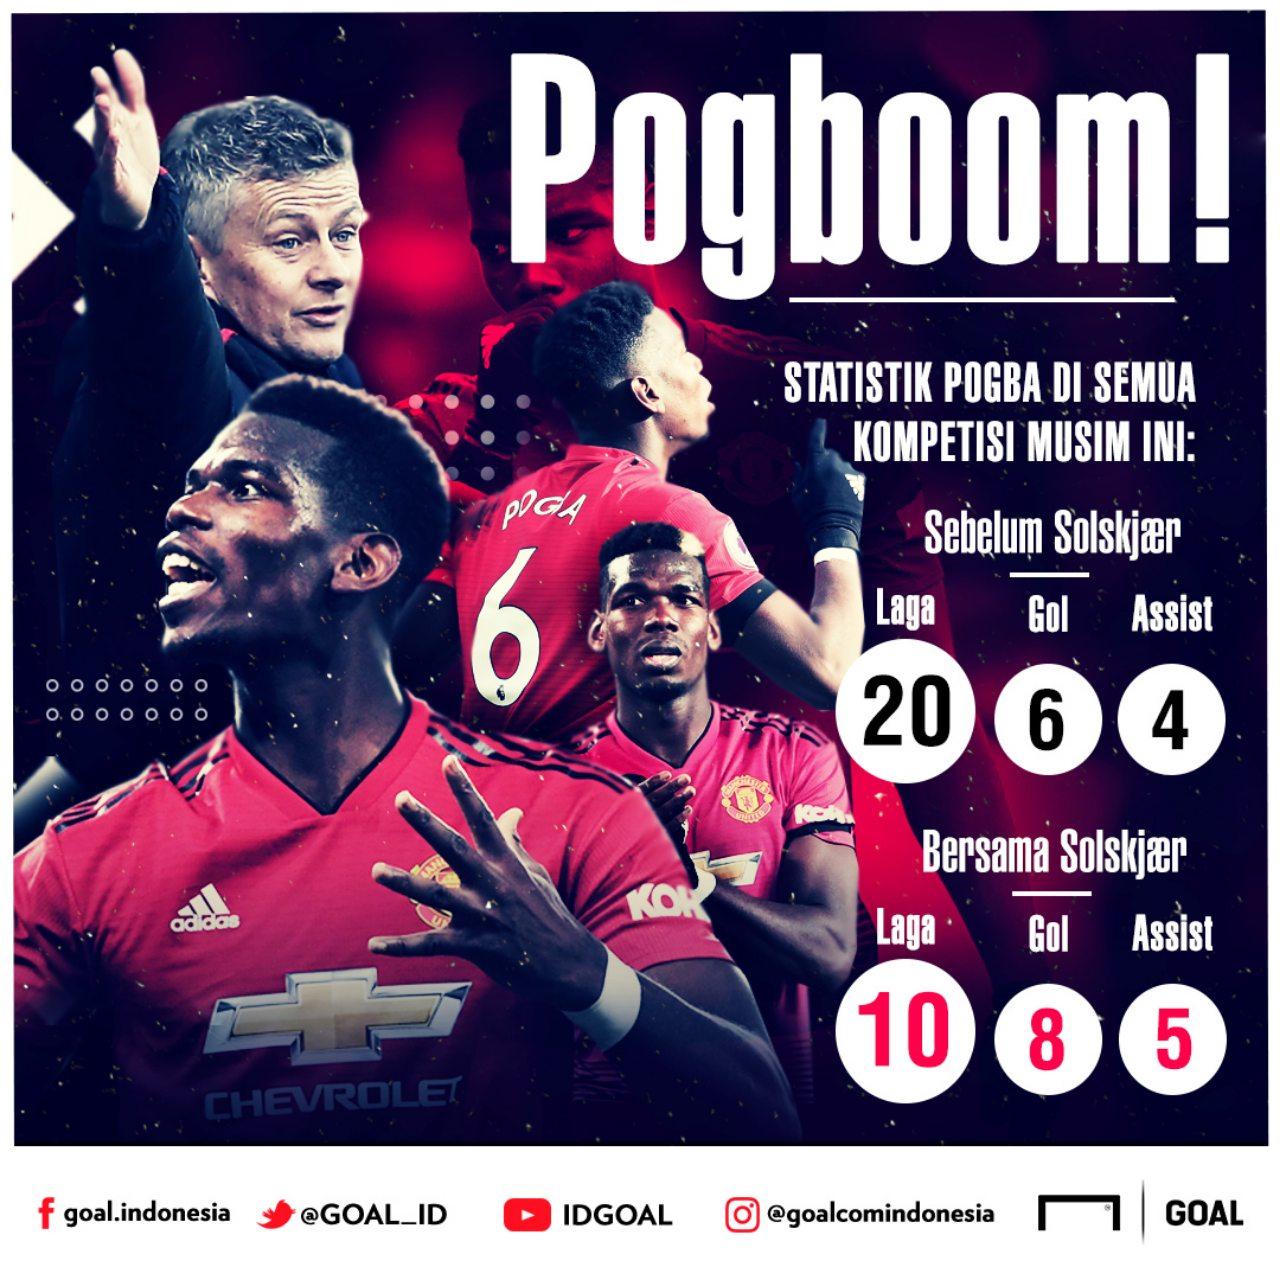 GFXID Pogboom! - Paul Pogba   Manchester United & Ole Gunnar Solskjaer